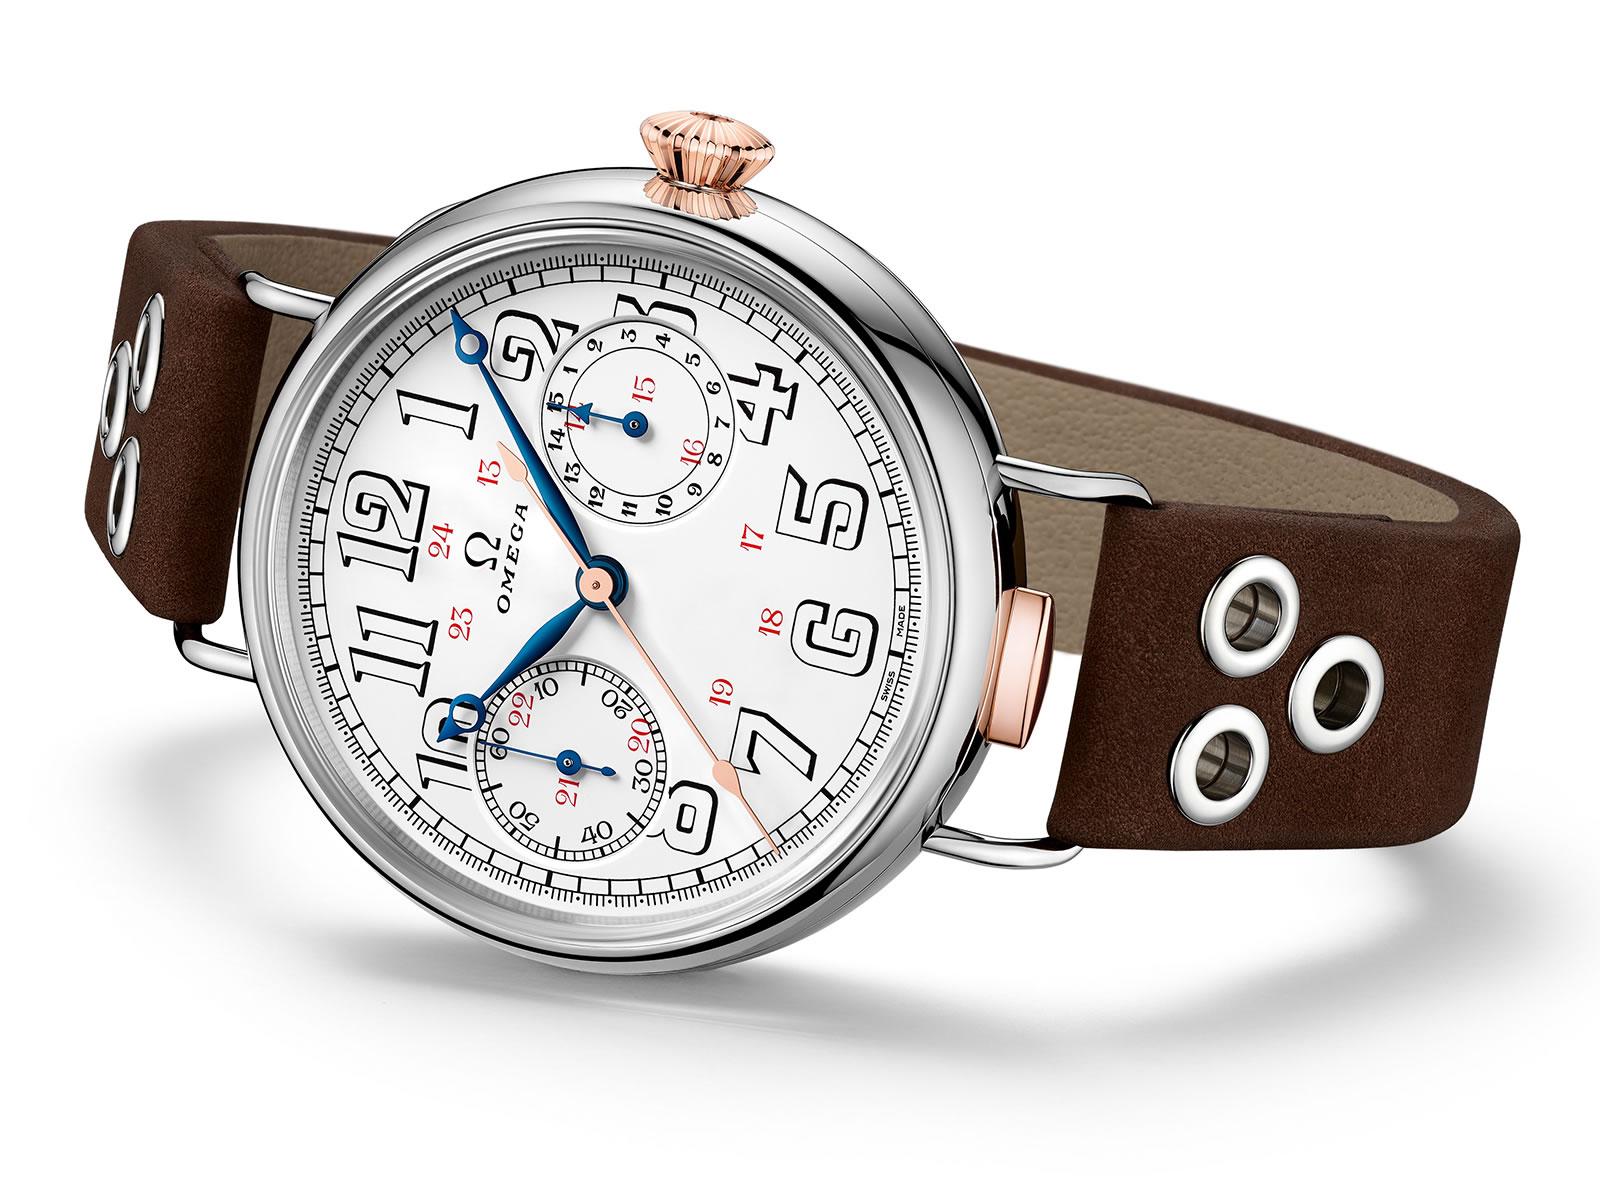 516-52-48-30-04-001-omega-18-chro-wrist-chronograph-limited-edition-8.jpg